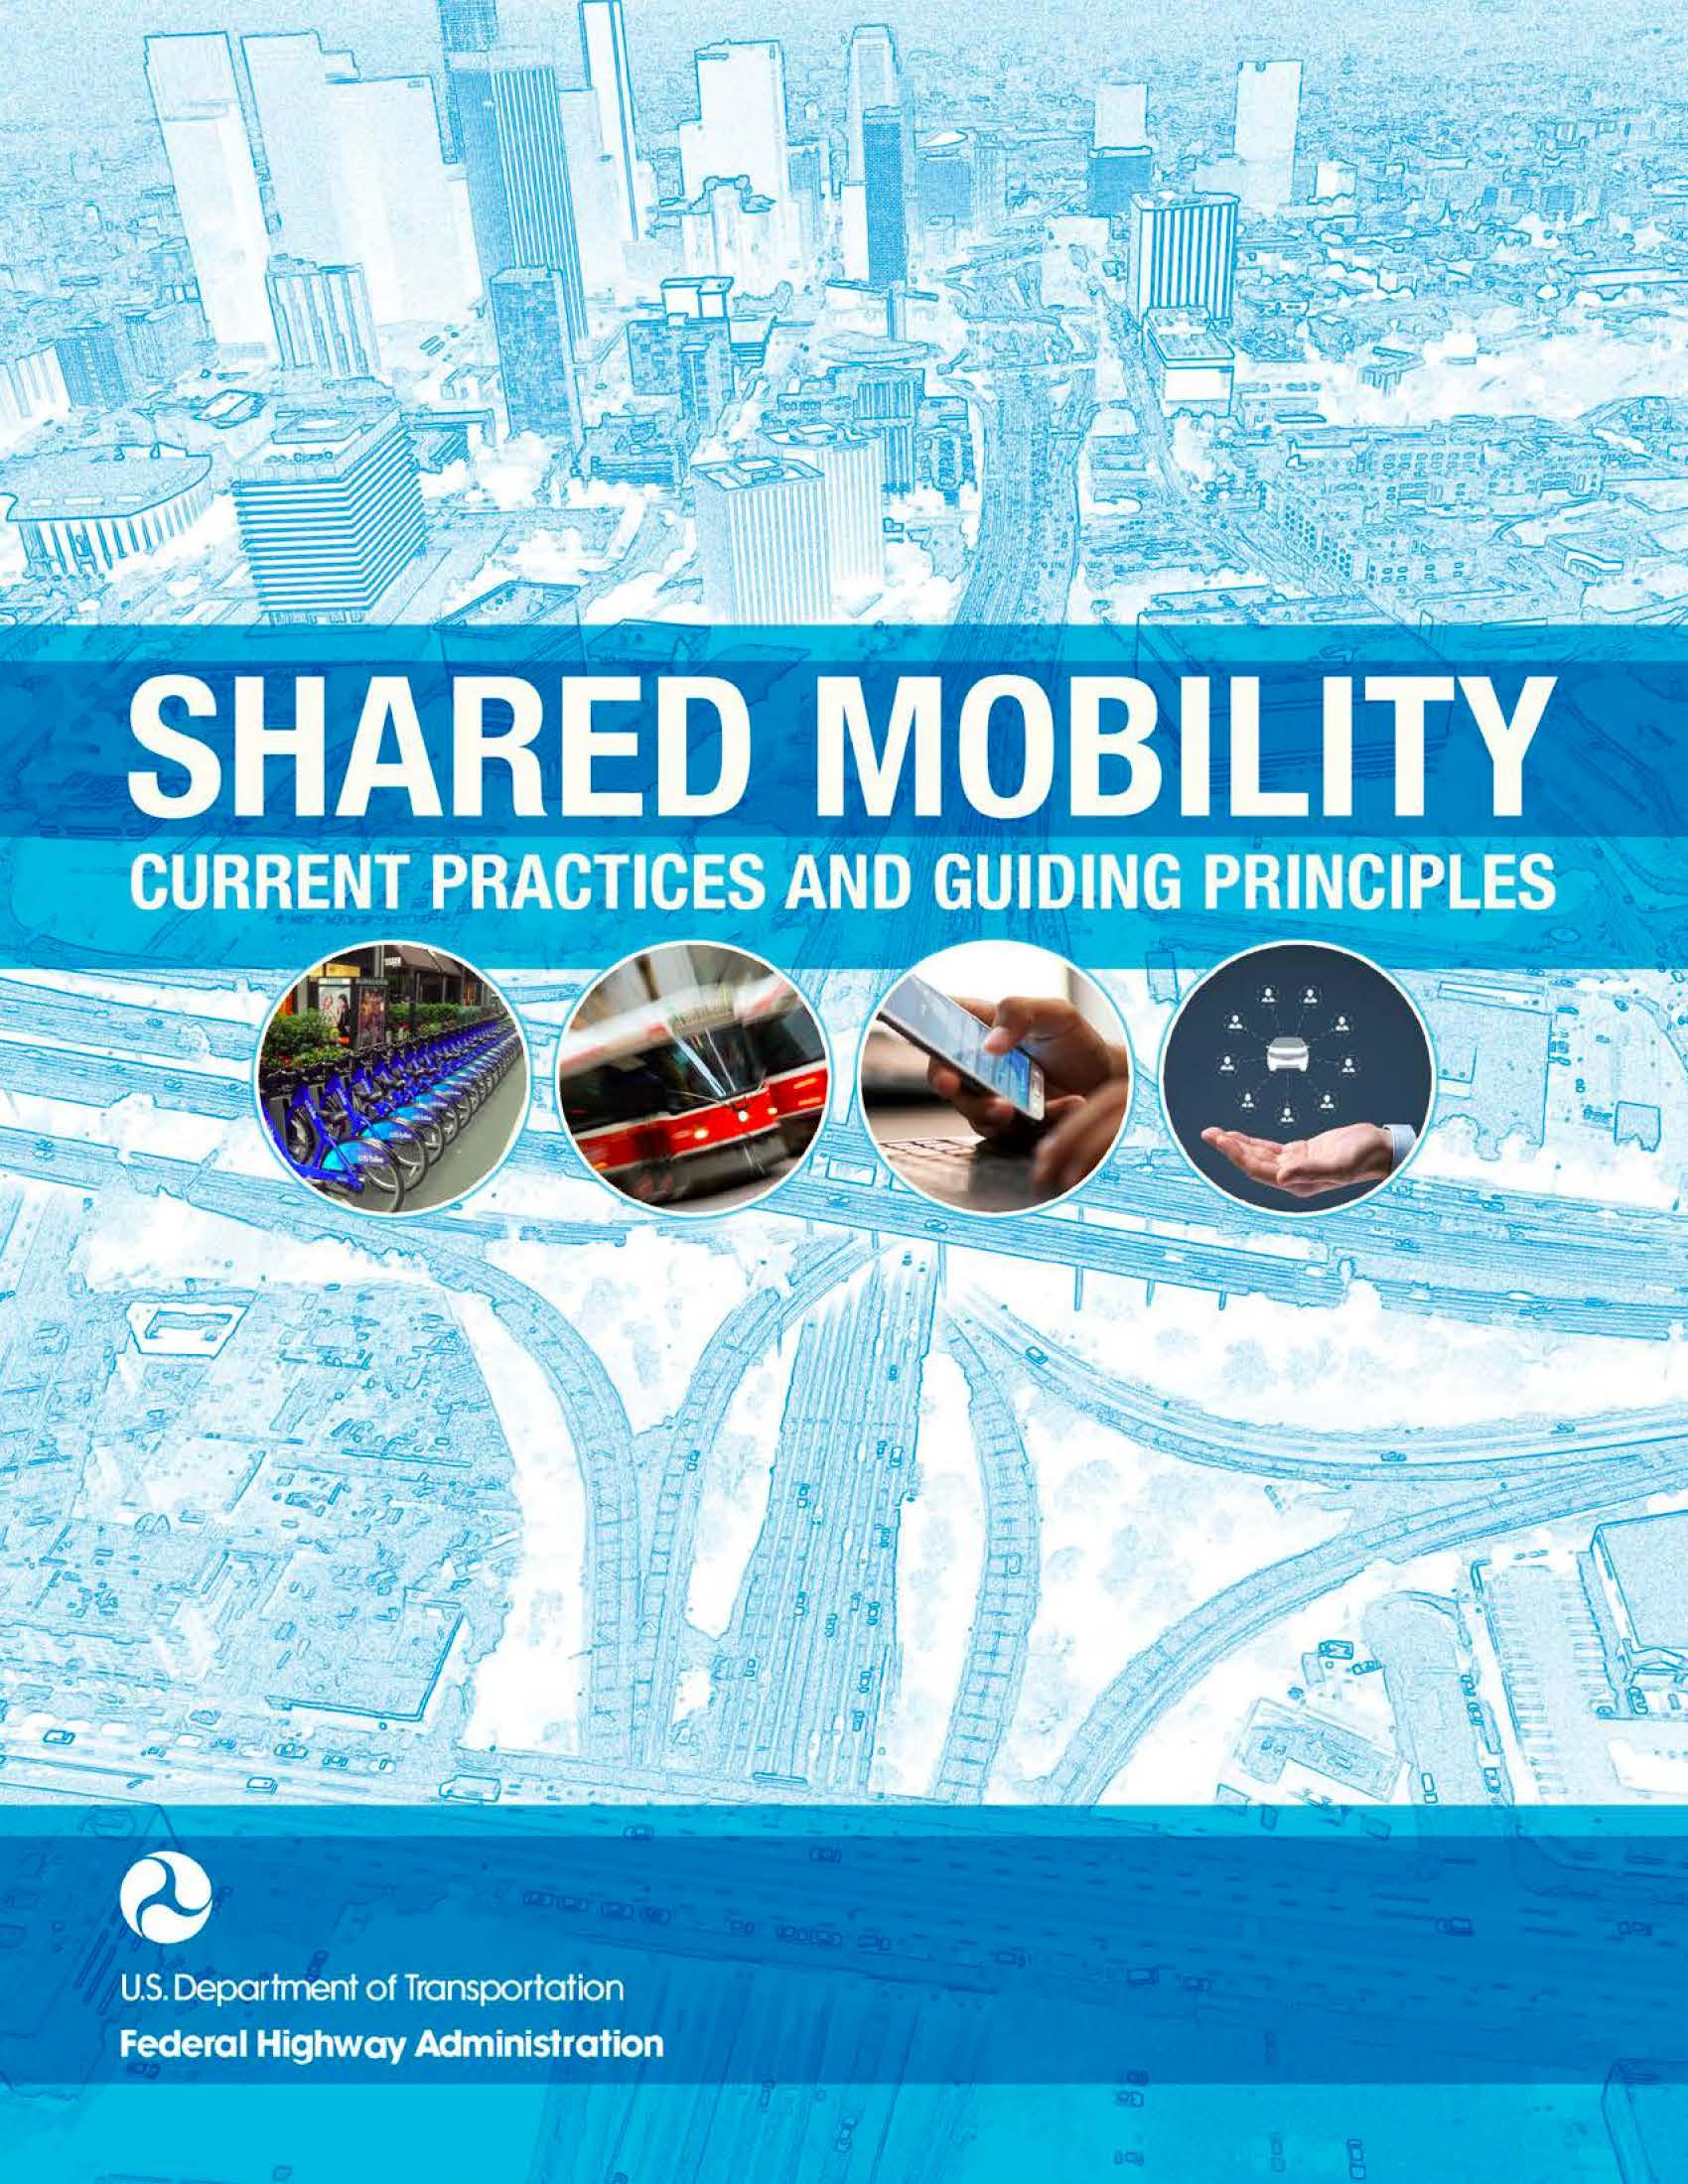 MaaS/MOD ITE Initiative - Institute of Transportation Engineers